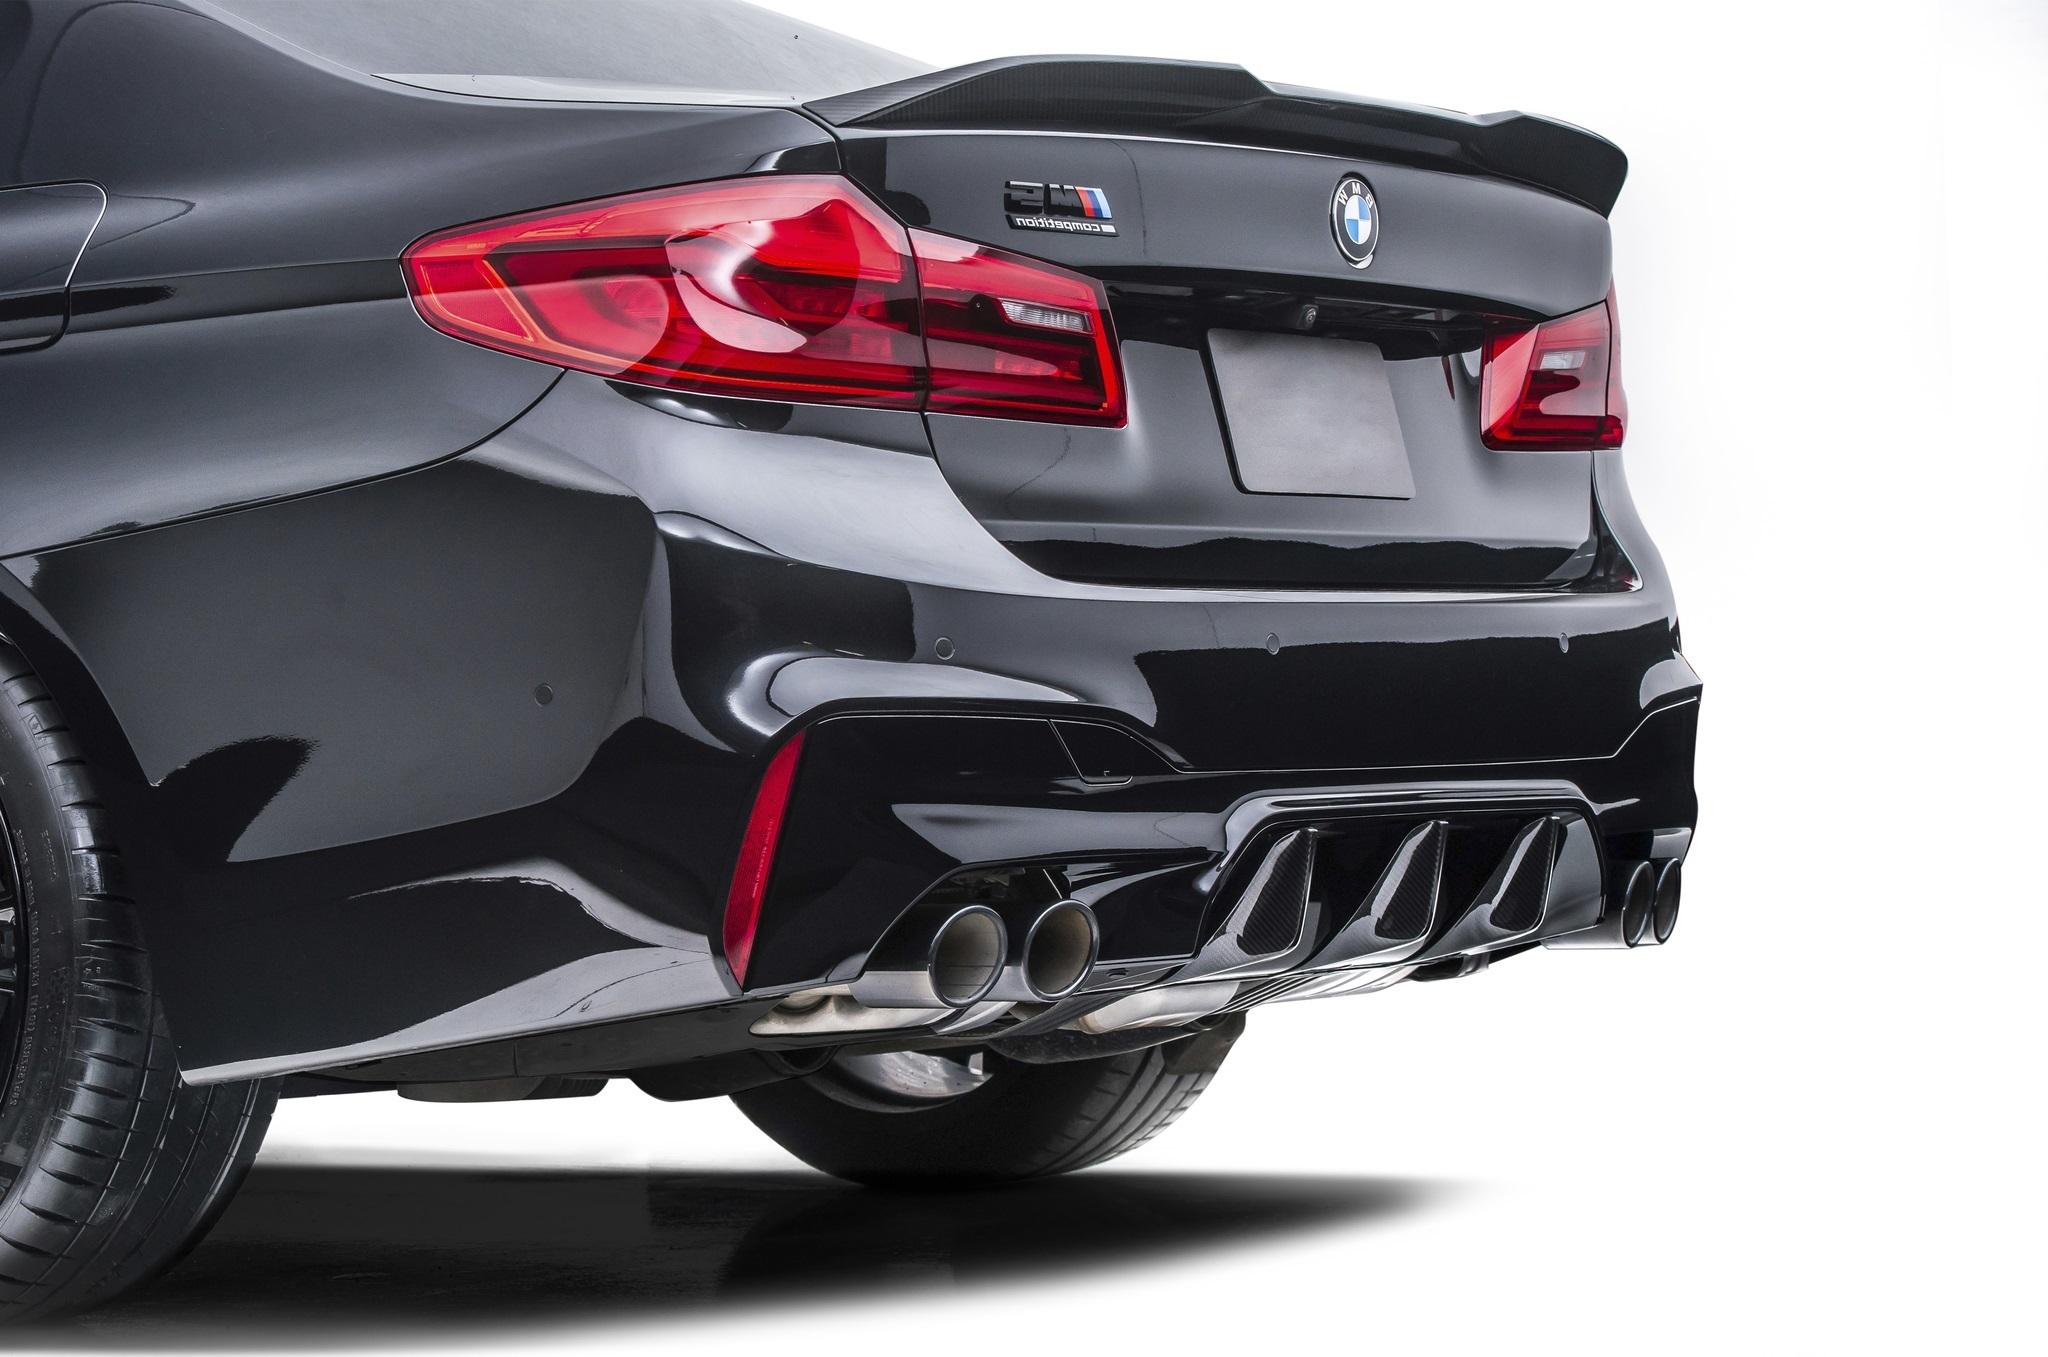 Sterckenn Carbon Fiber diffuser for BMW M5 F90 new model